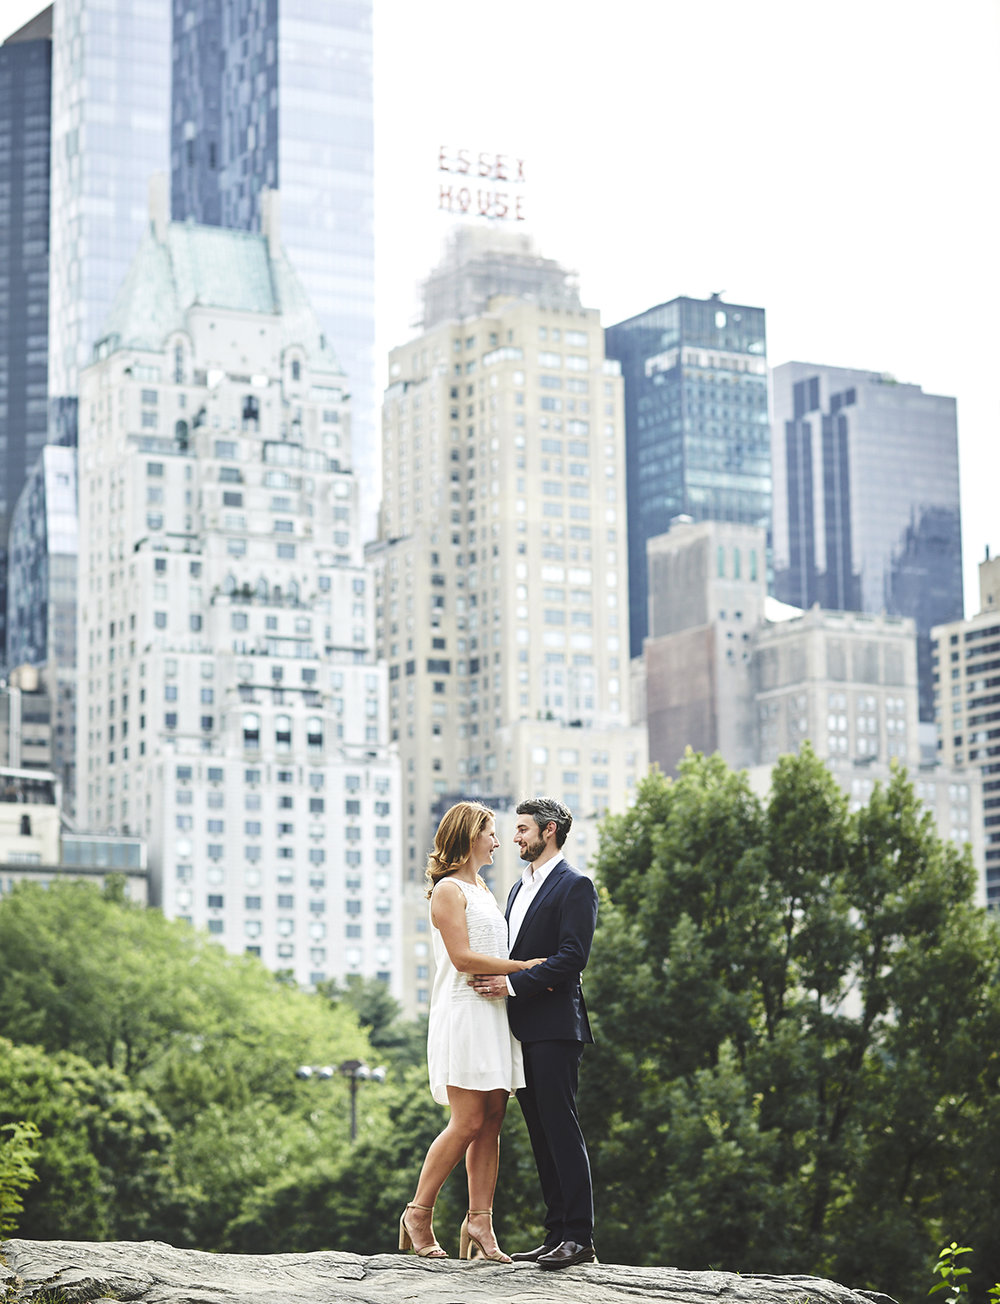 170720_EngagementPhotography_CentralPark_By_BriJohnsonWeddings_0012.jpg